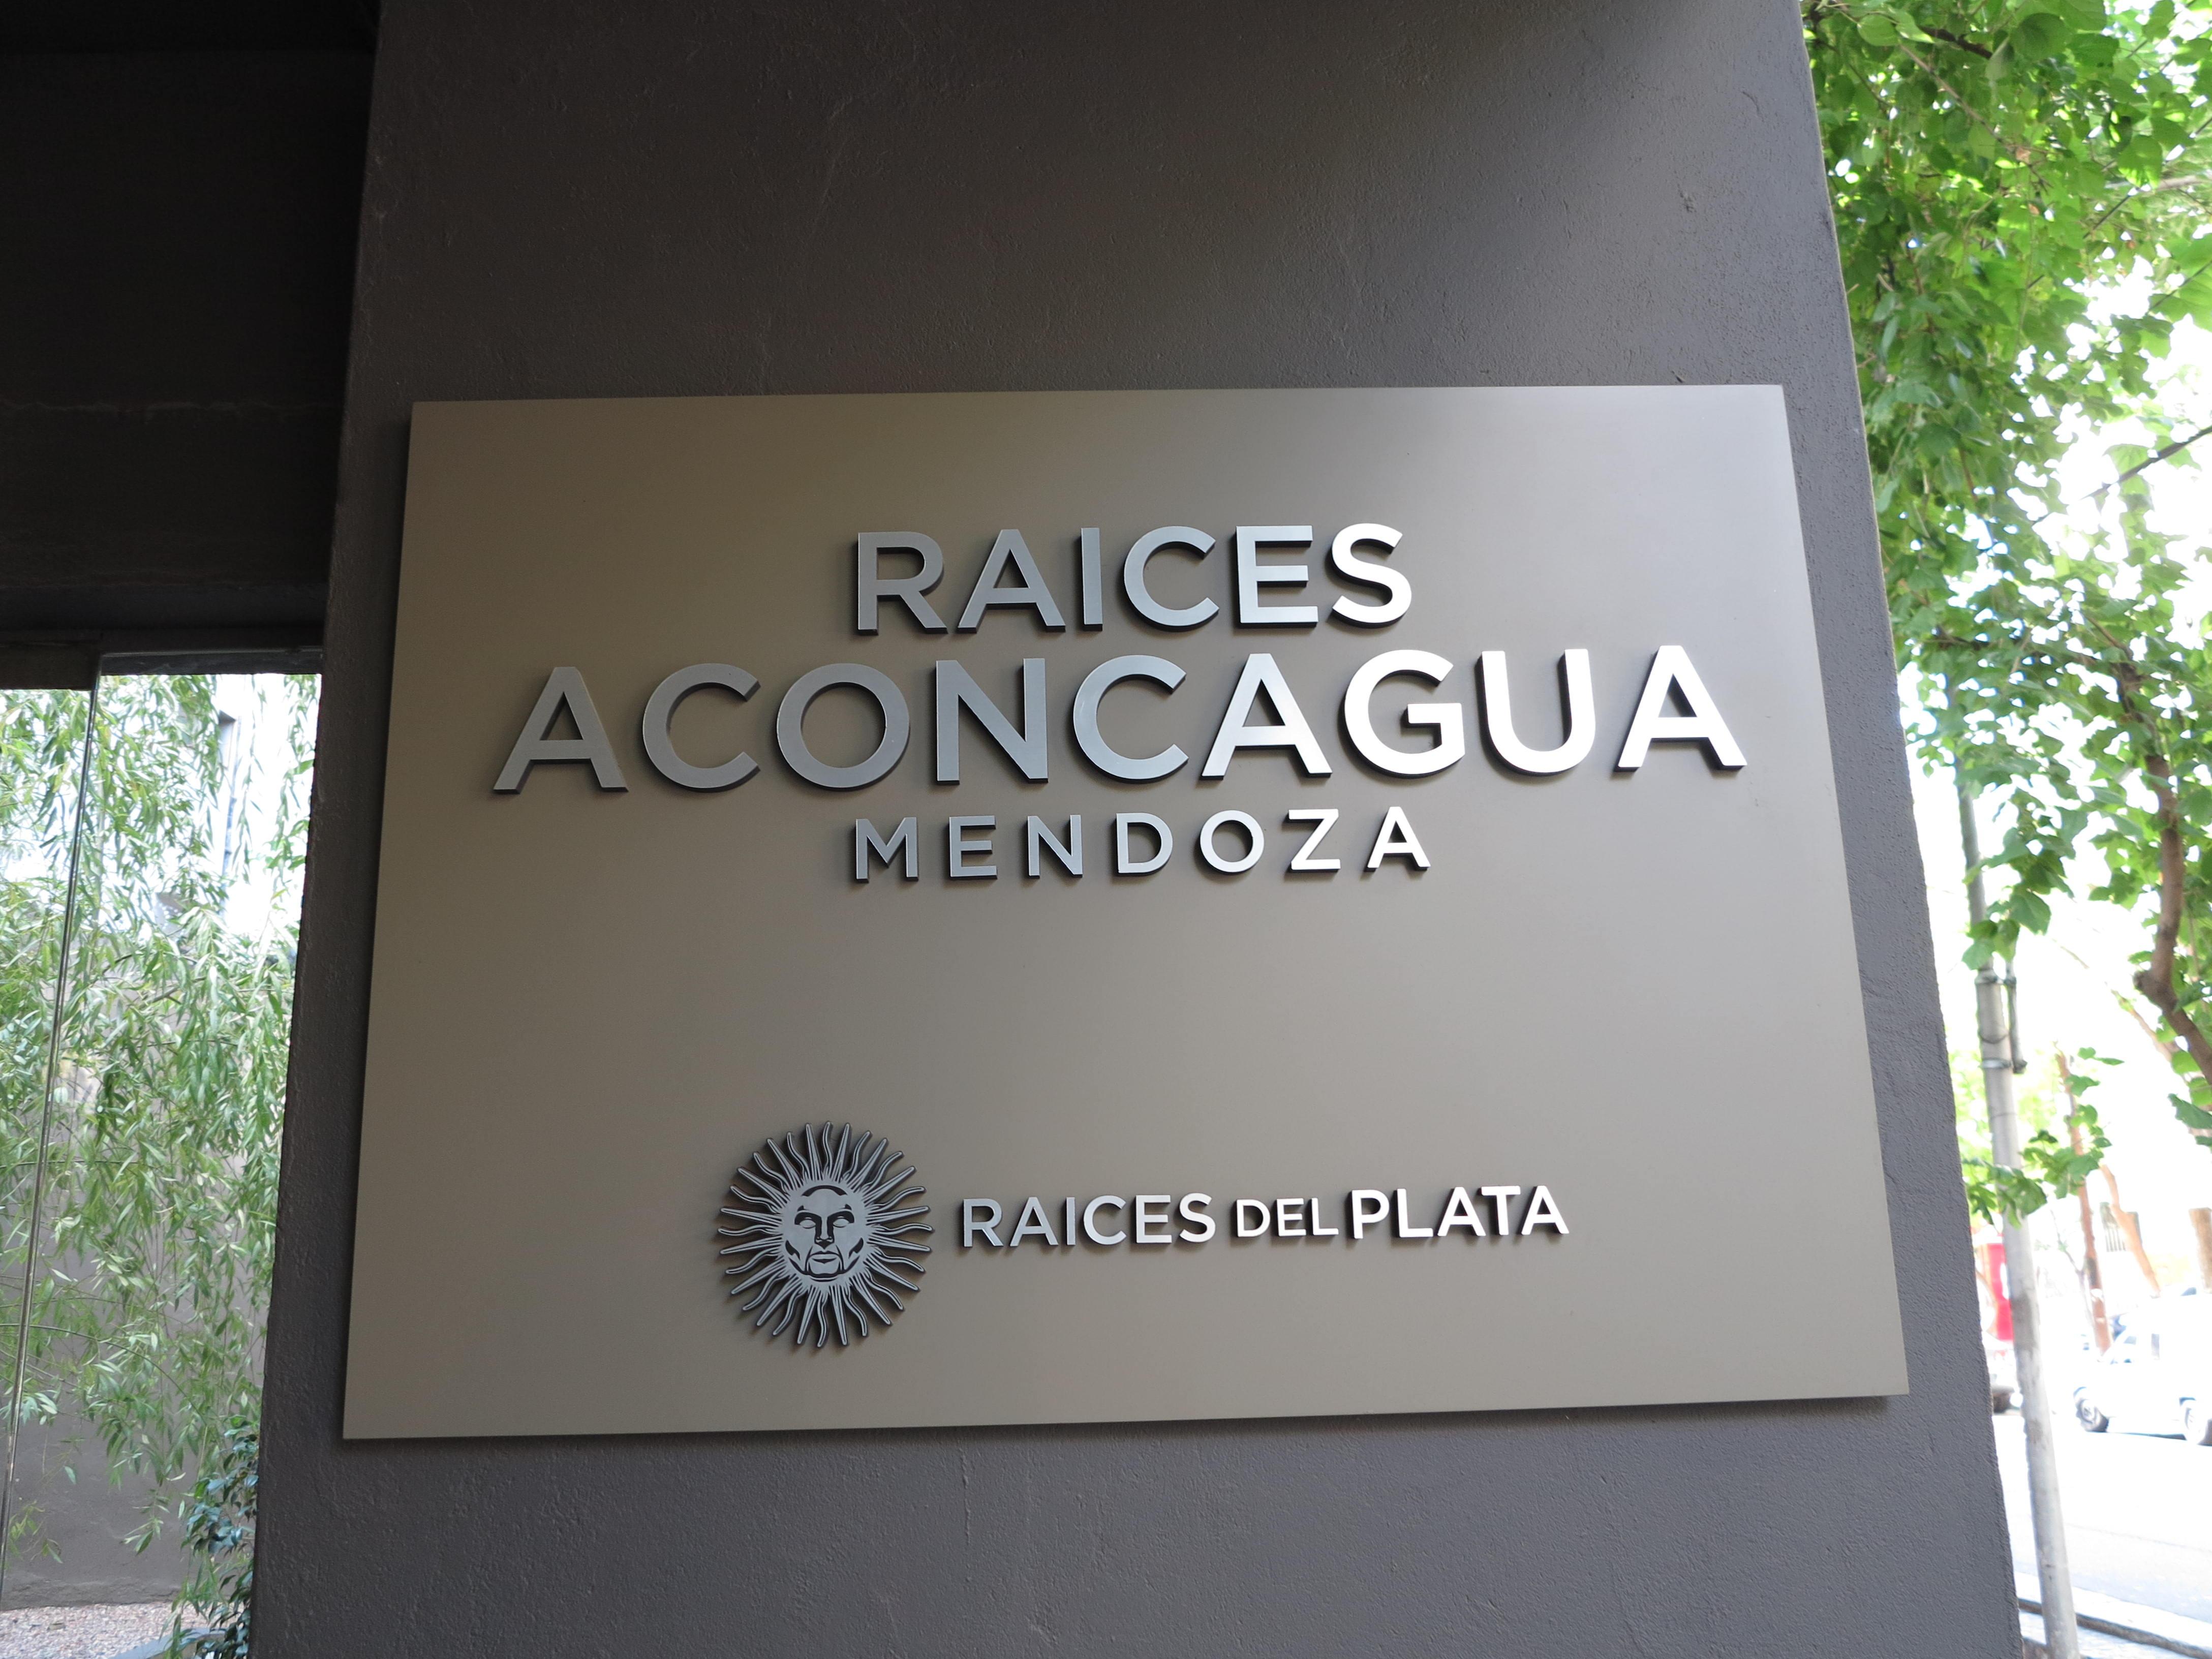 Hotel Raices Aconcagua - Mendoza